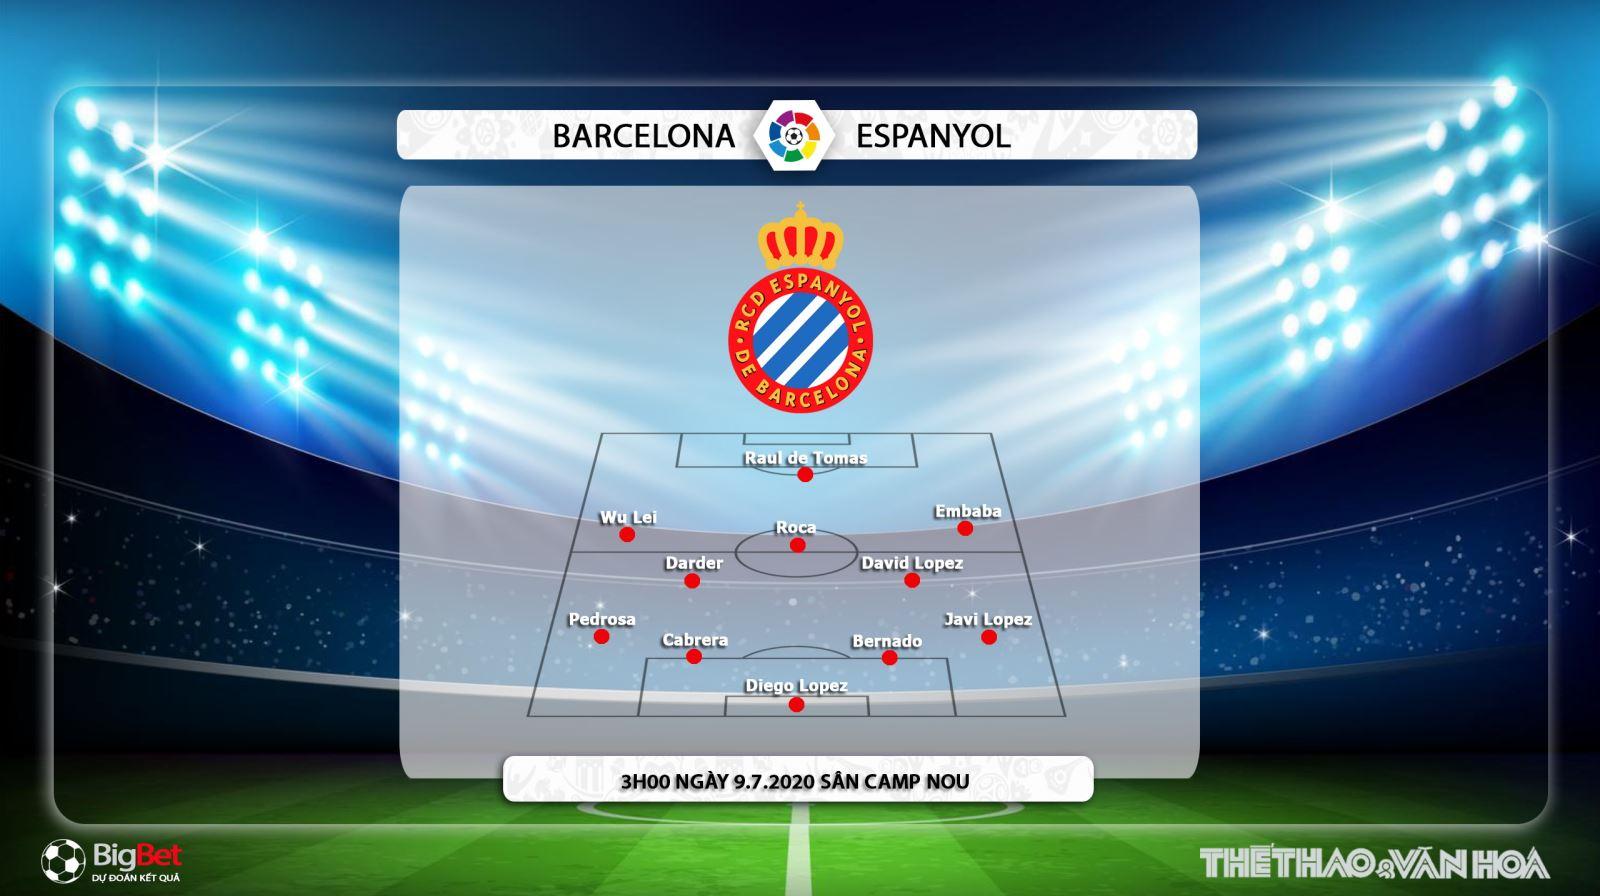 Barcelona vs Espanyol, Barcelona, Espanyol, trực tiếp bóng đá, trực tiếp Barcelona vs Espanyol, soi kèo, kèo bóng đá, la liga